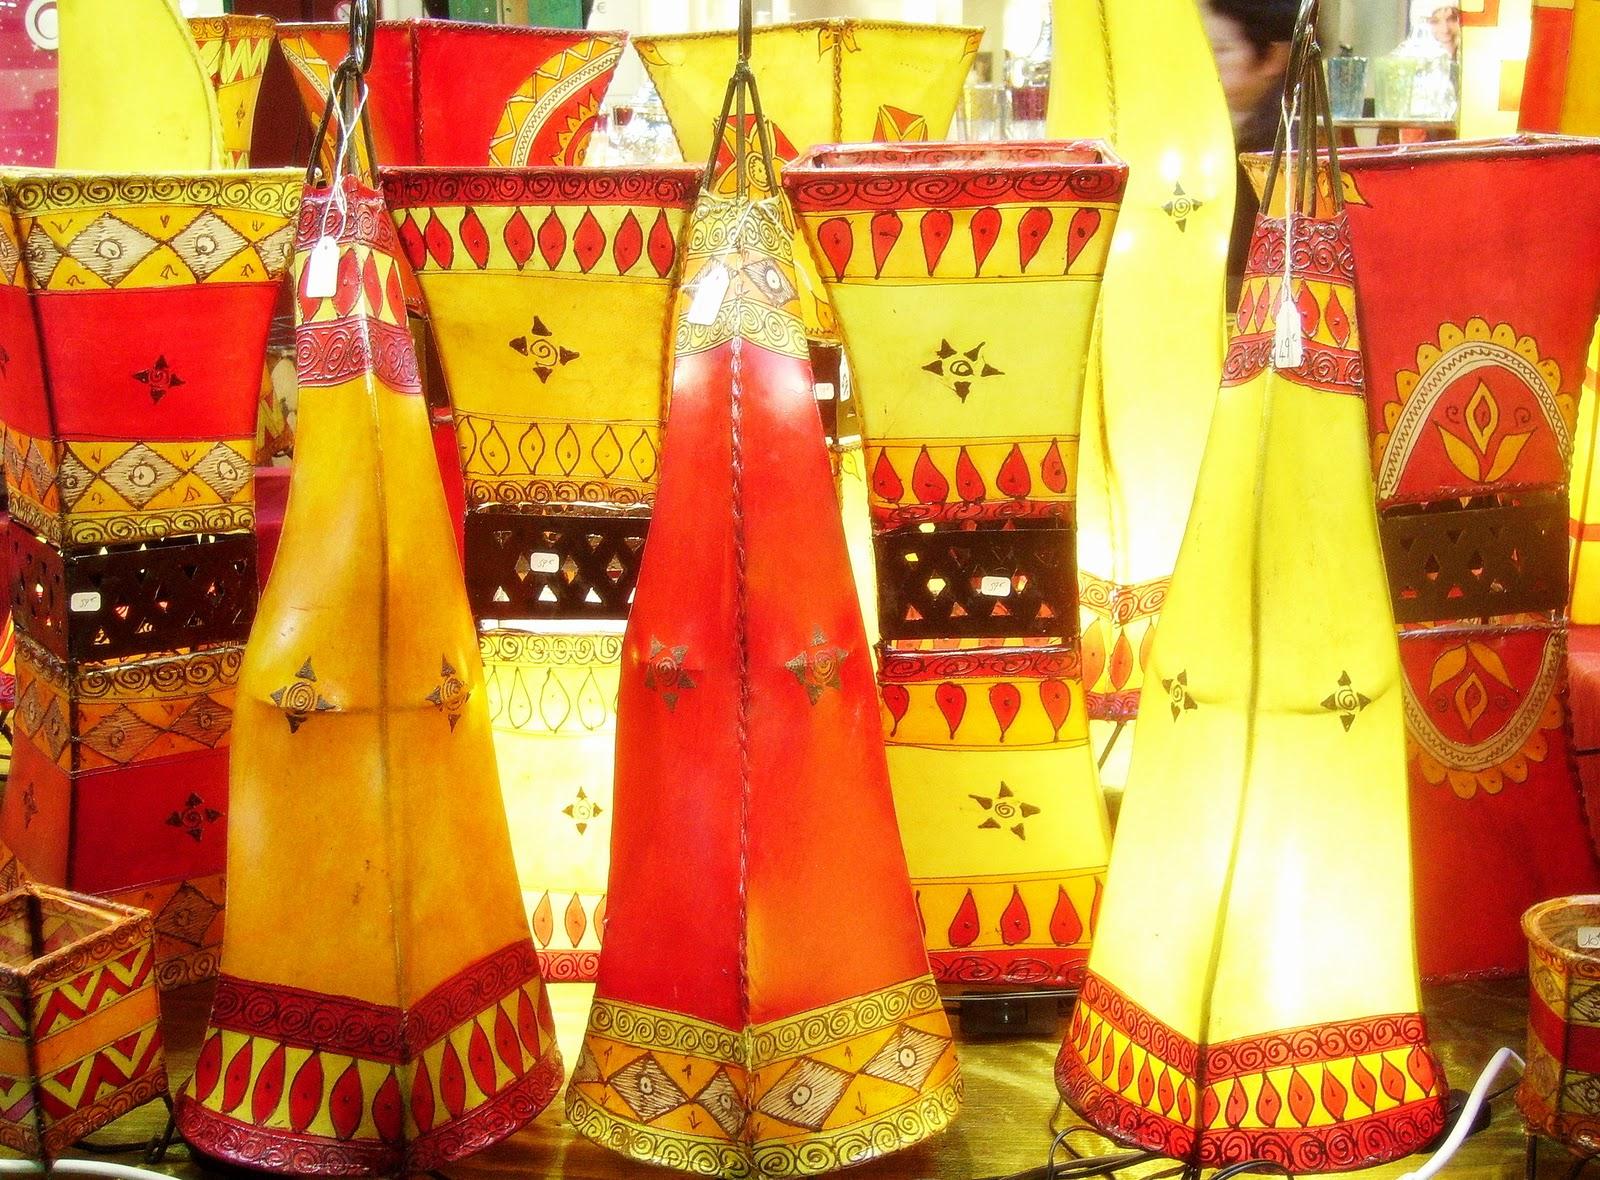 Lampes marocain, artisanat marocain.: Artisanat Du Maroc